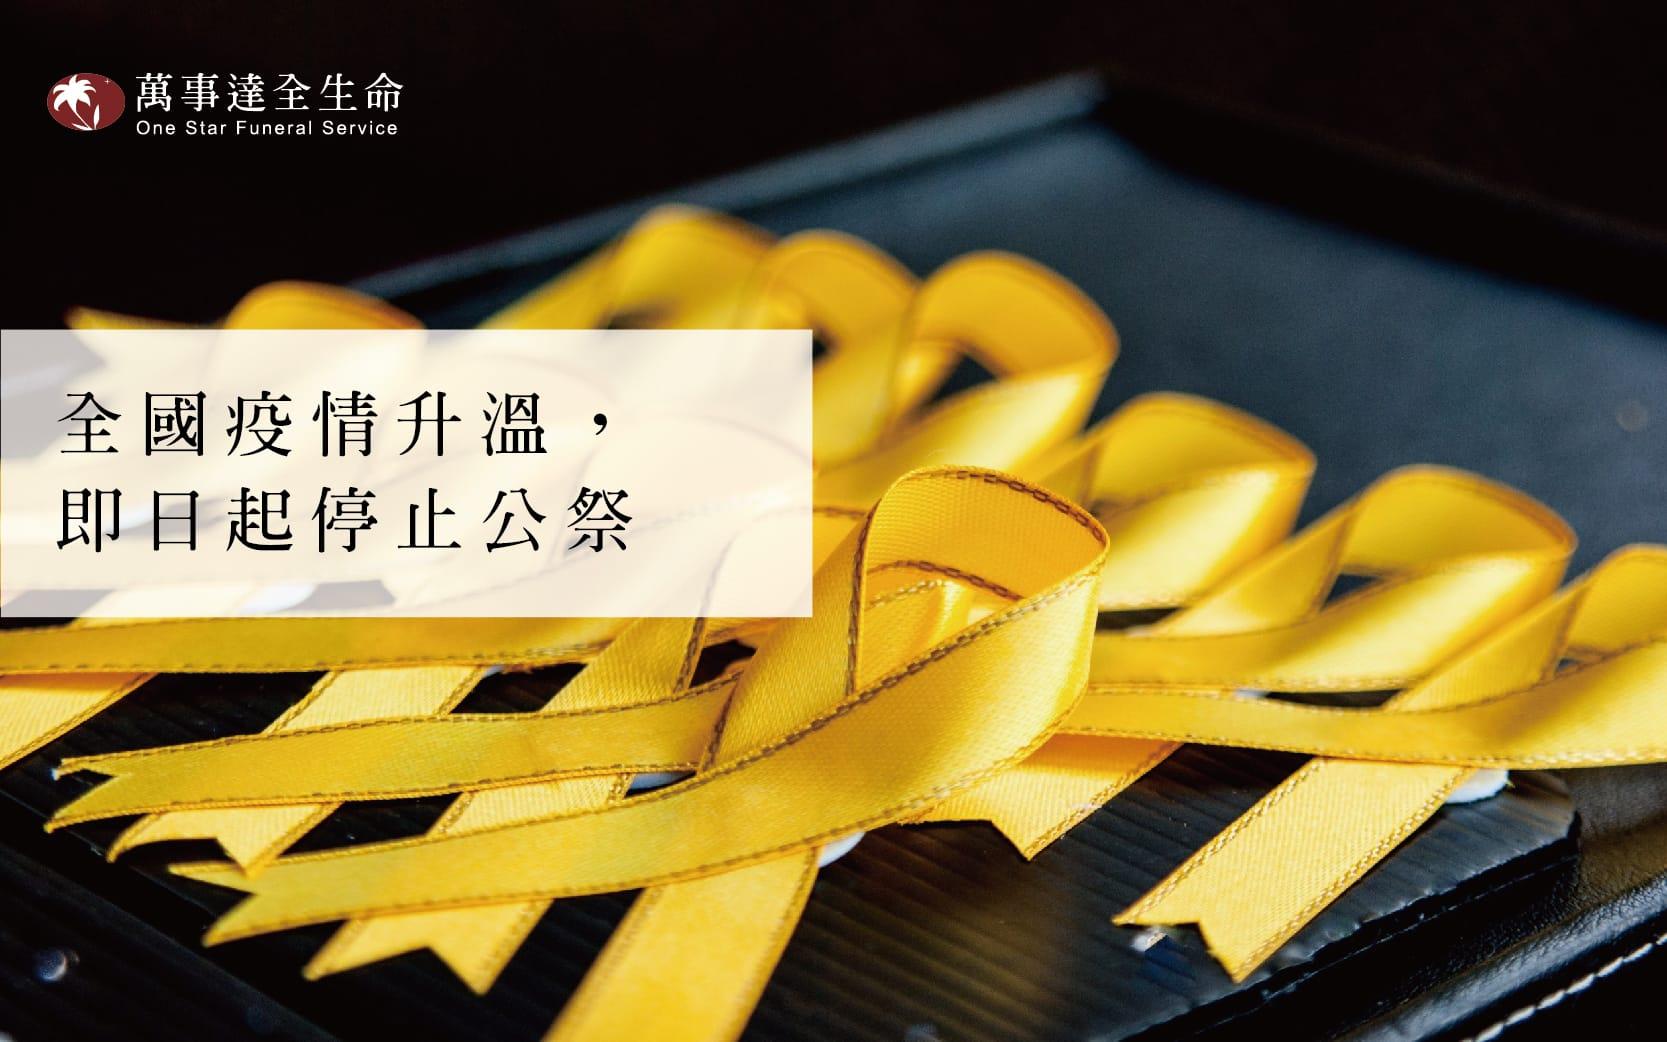 Read more about the article 全國新冠肺炎疫情升溫,即日起停止公祭